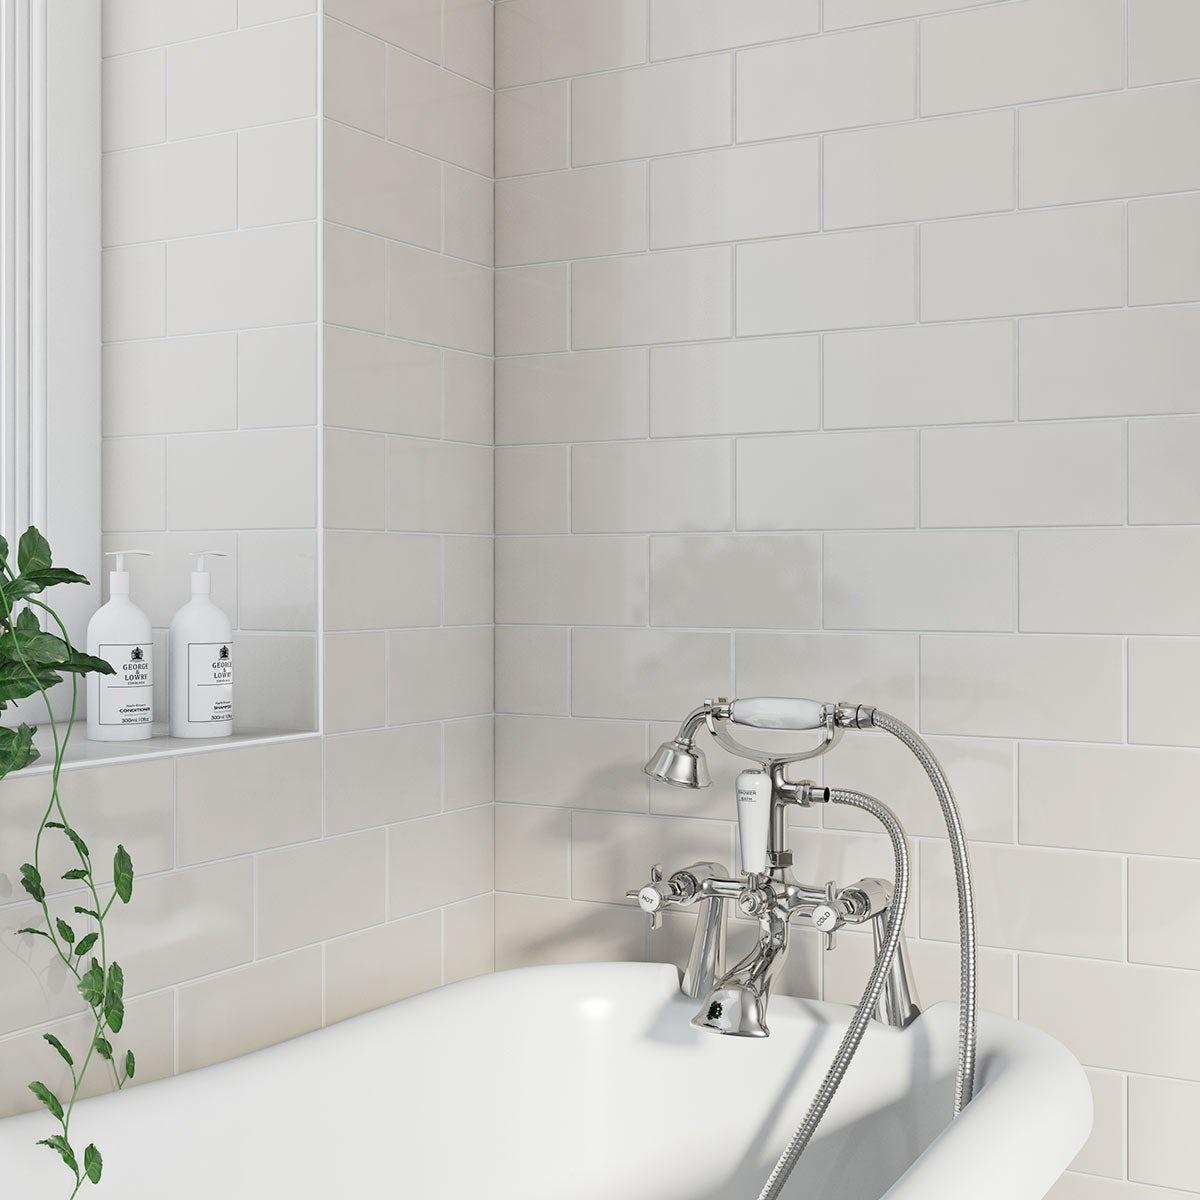 British Ceramic Tile Metro Cream Gloss 100mm x 200mm - Box of 50